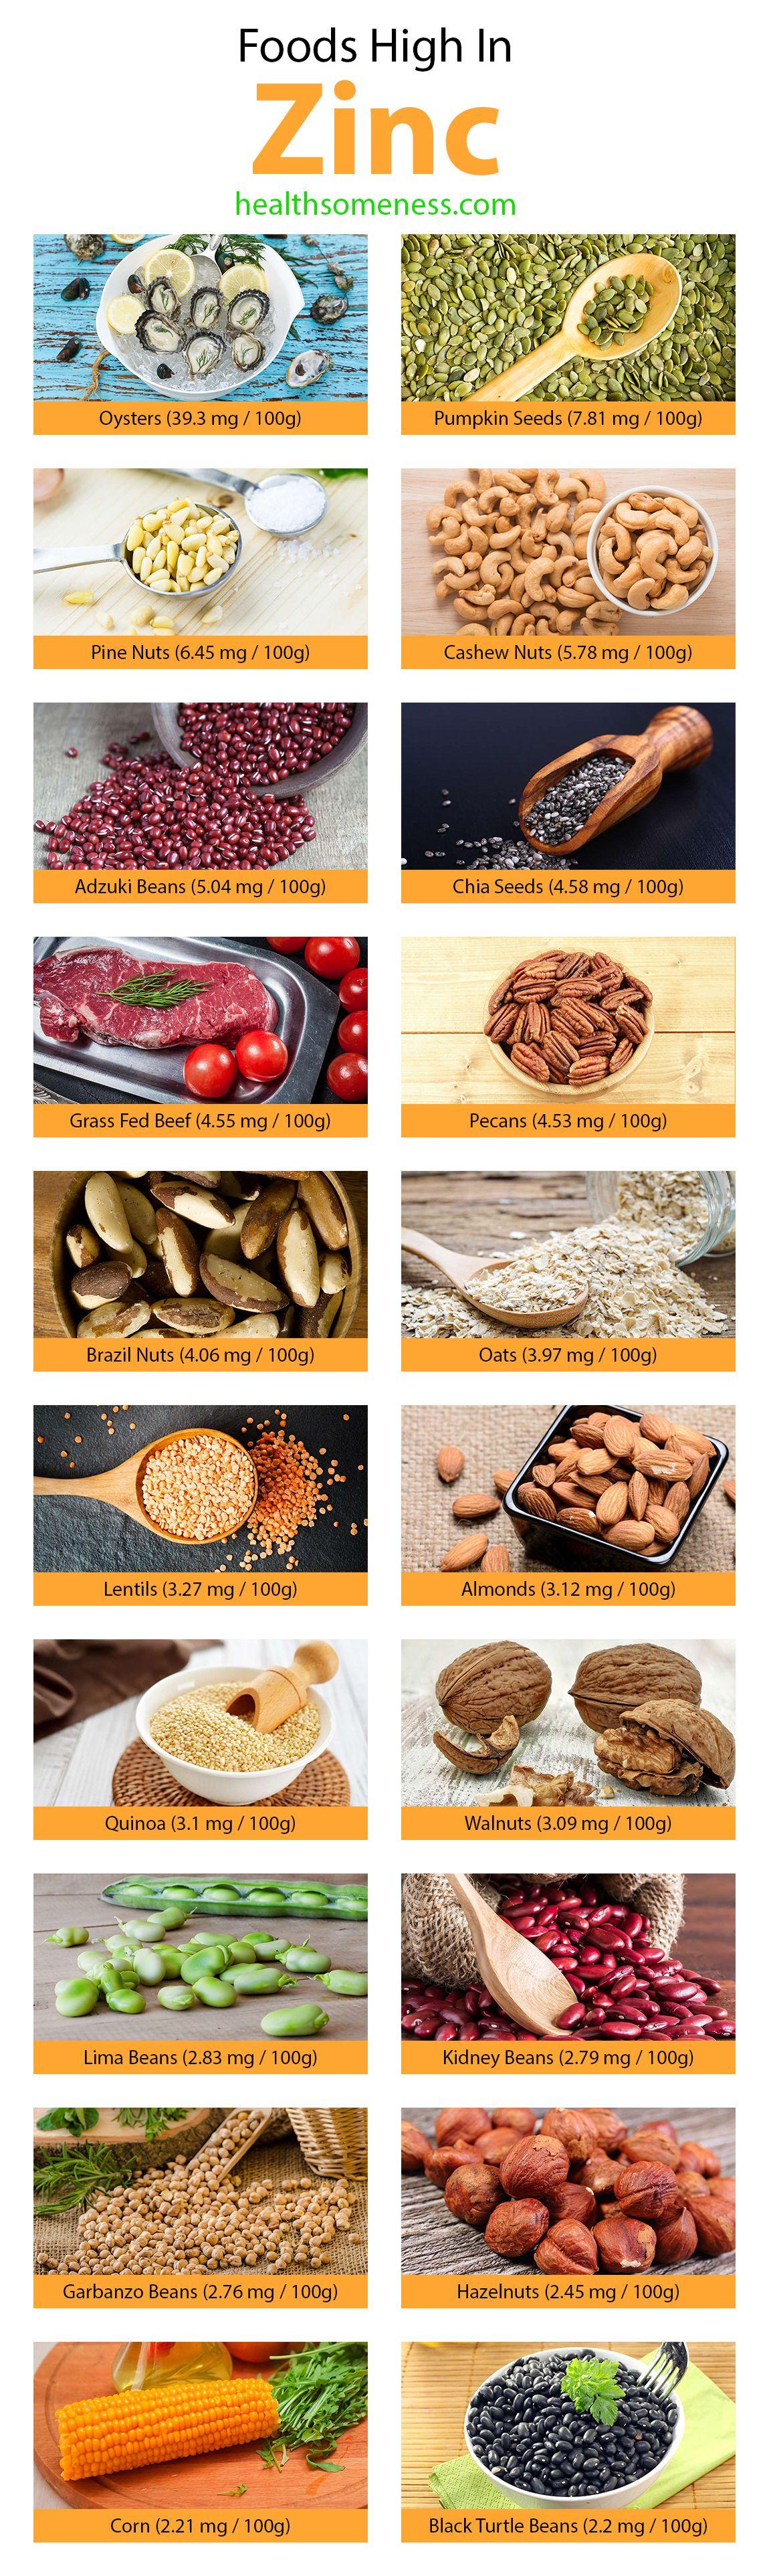 36 Foods High In Zinc Foods high in zinc, Zinc rich